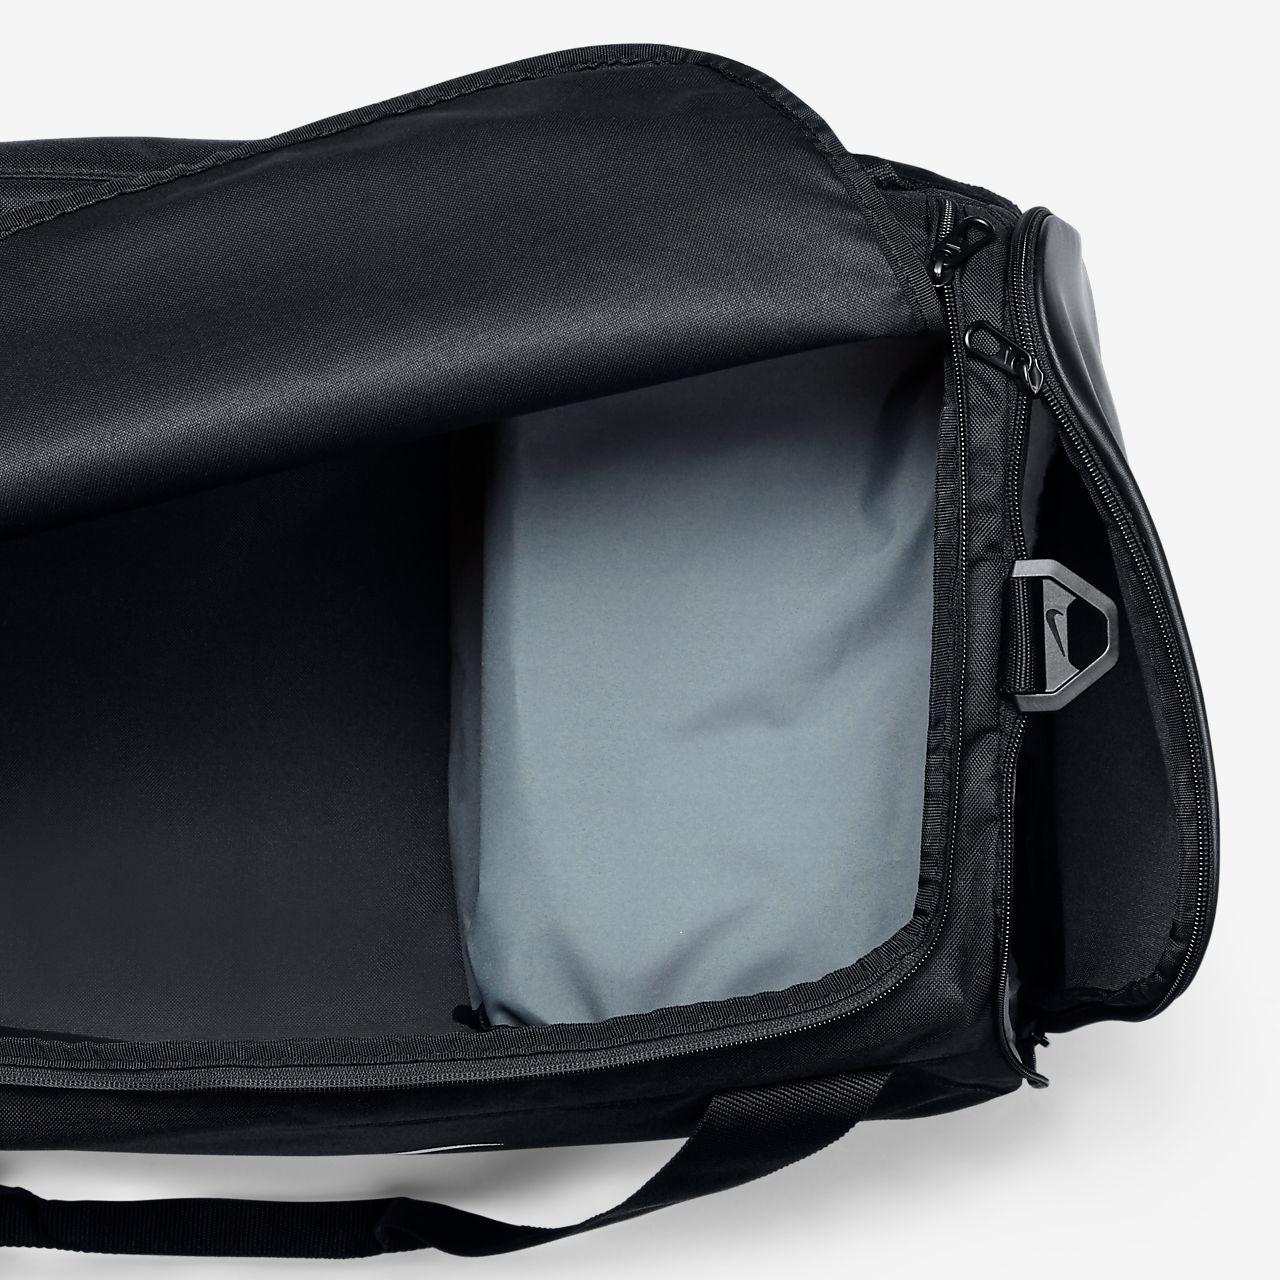 6288a4c5e1 Nike Brasilia (Large) Training Duffel Bag. Nike.com GB